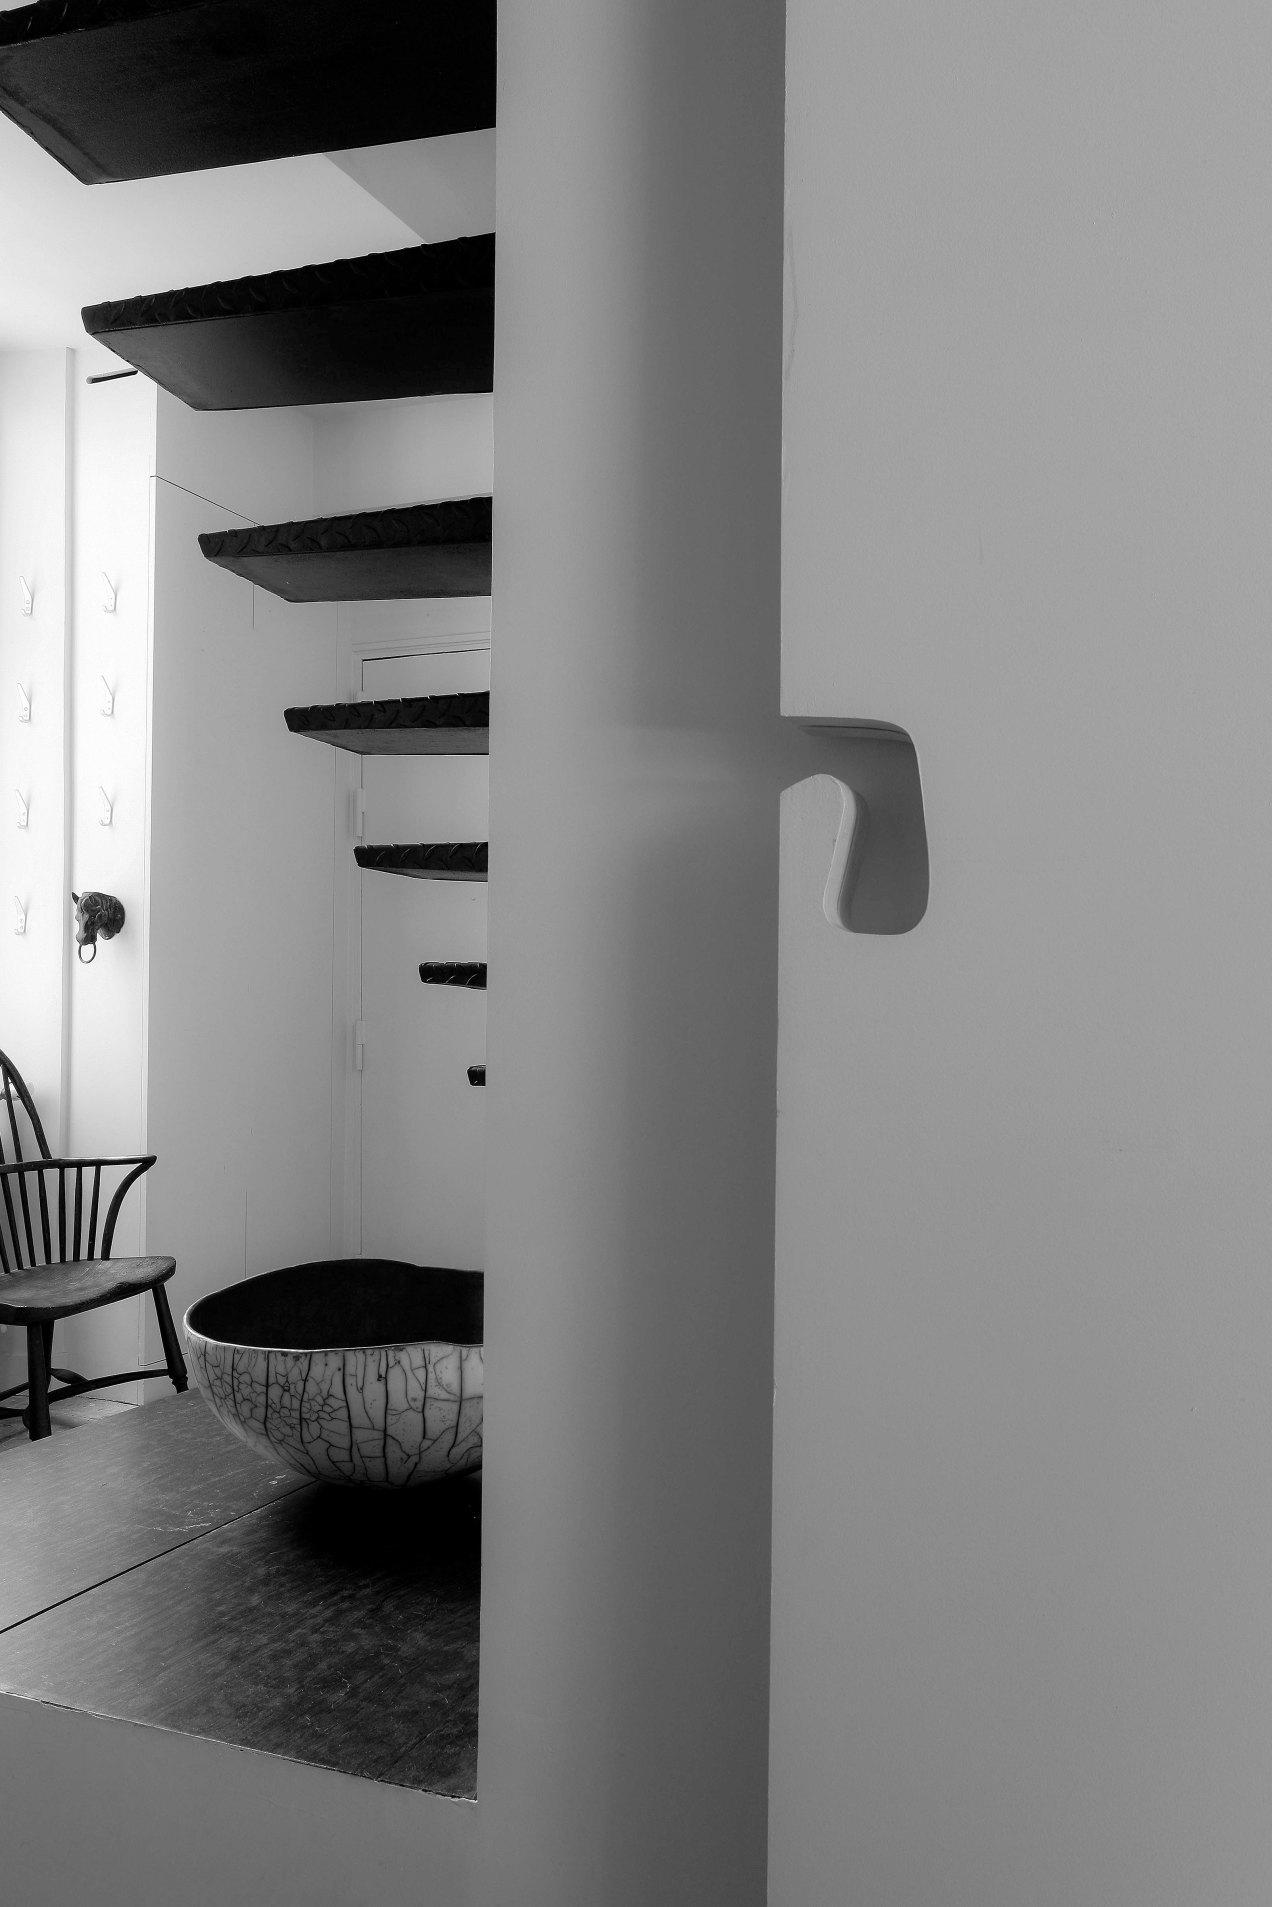 Escalier, Frédéric Lebard, Paris, rue Visconti, gildalliere, 2006